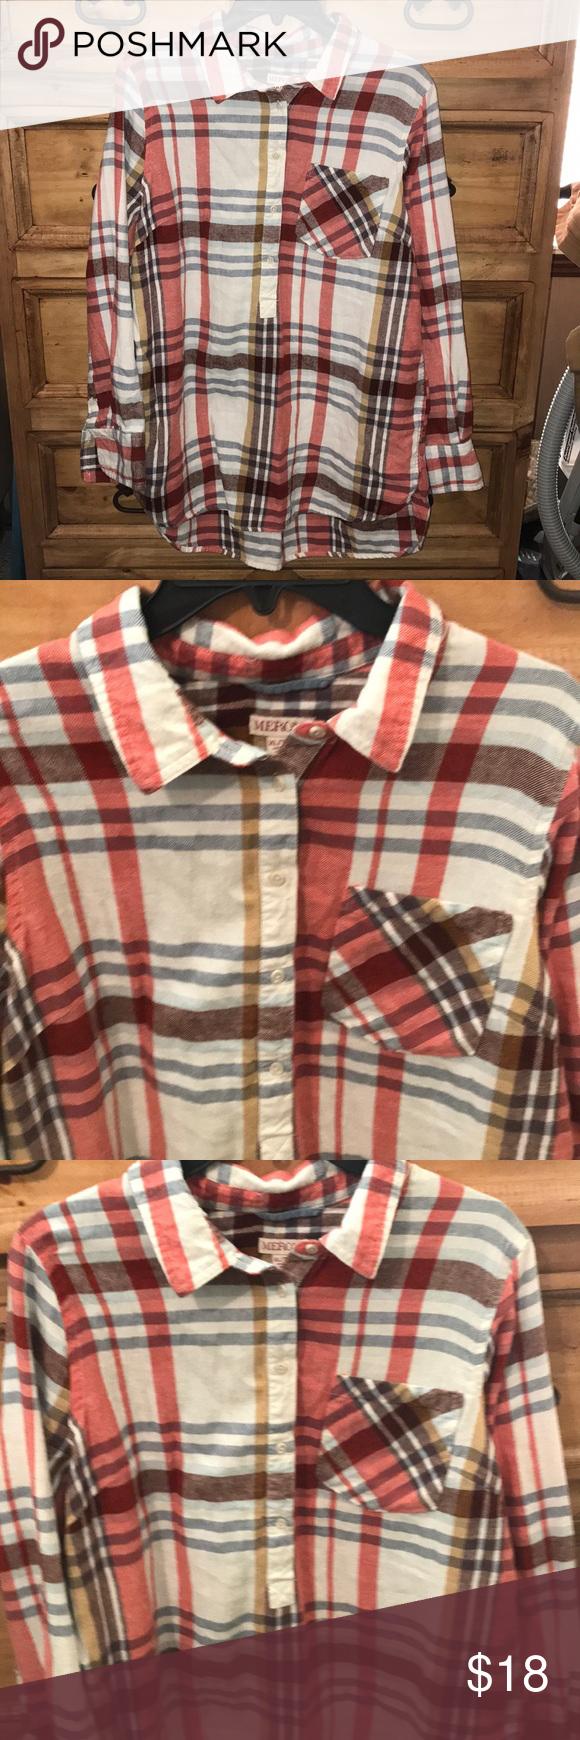 Womenus flannel shirt  Flannel shirts Flannels and Tunics